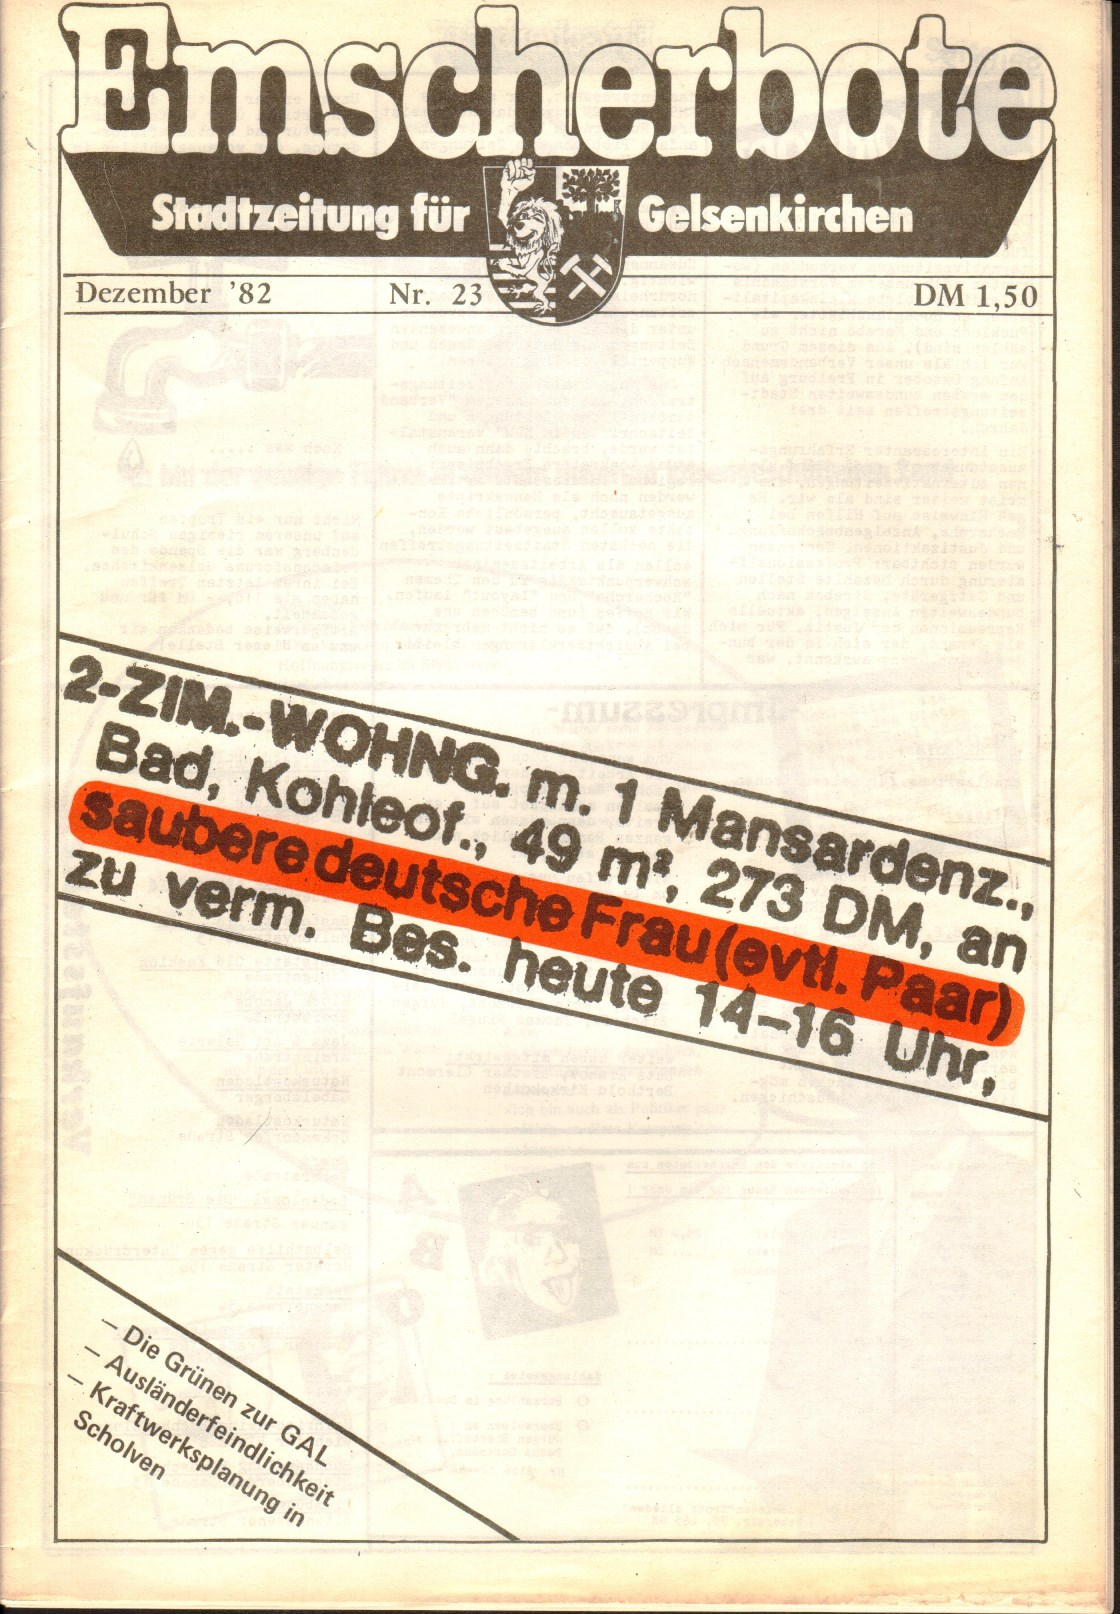 Gelsenkirchen_Emscherbote_1982_23_01